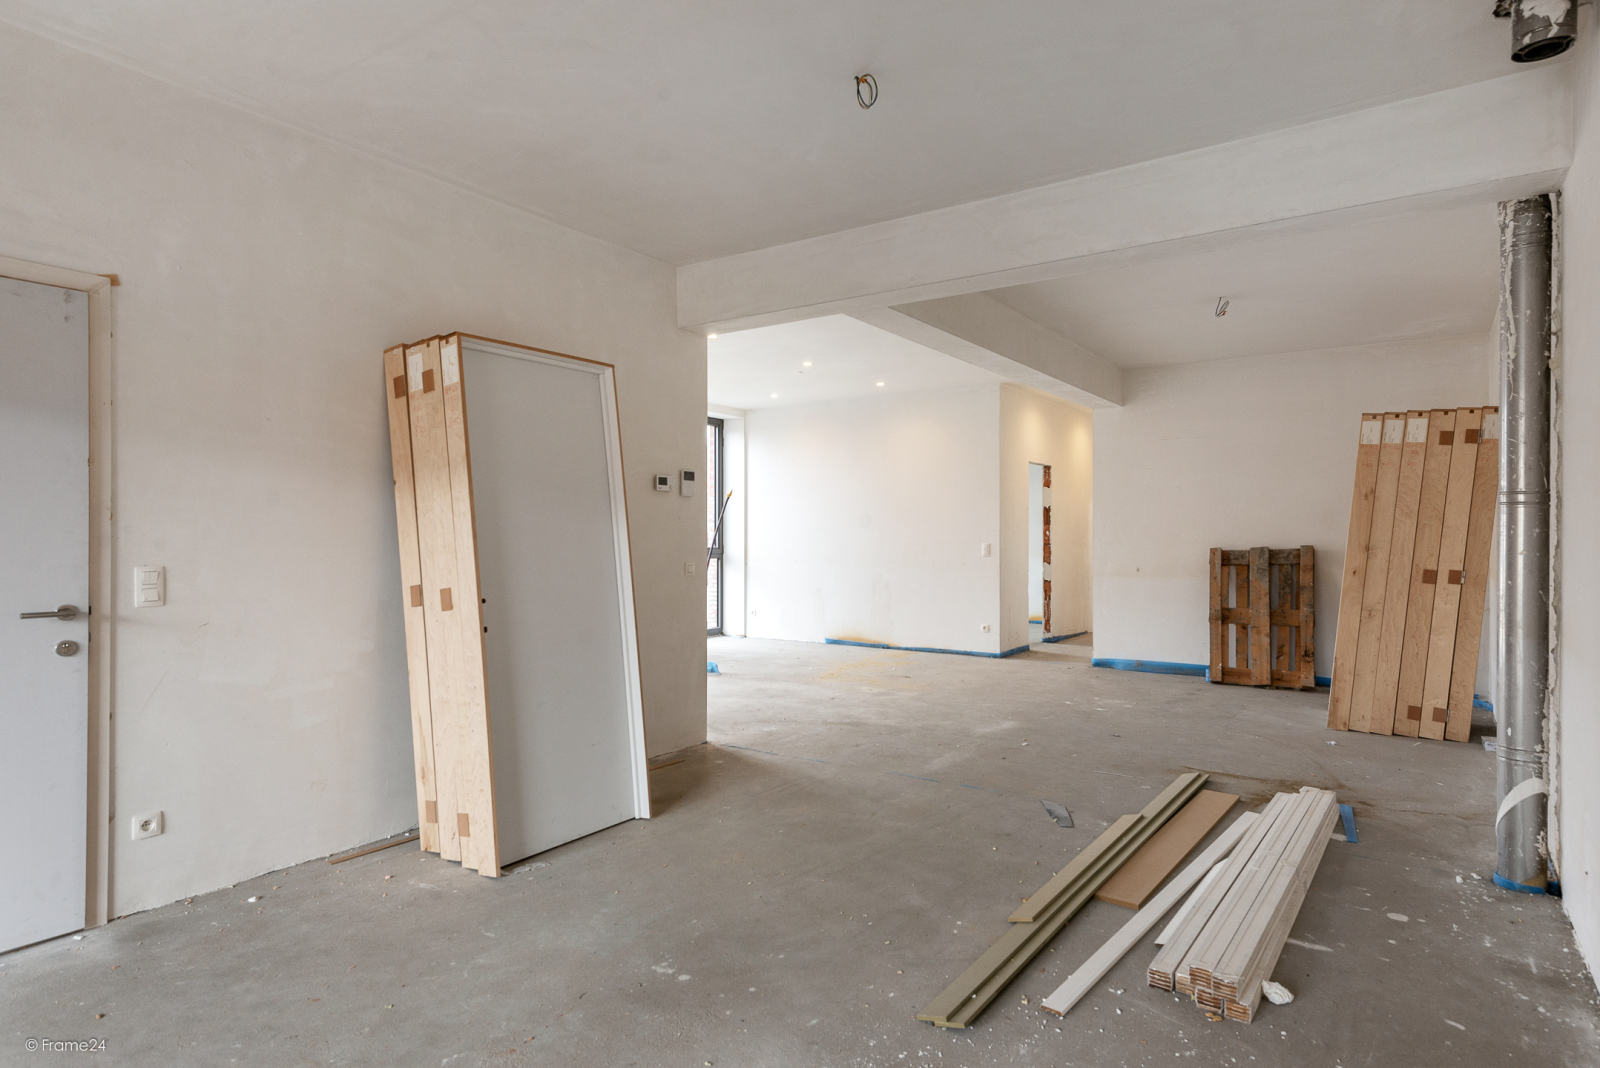 Riant vernieuwd appartement (147 m²) op centrale ligging te Walem! afbeelding 4